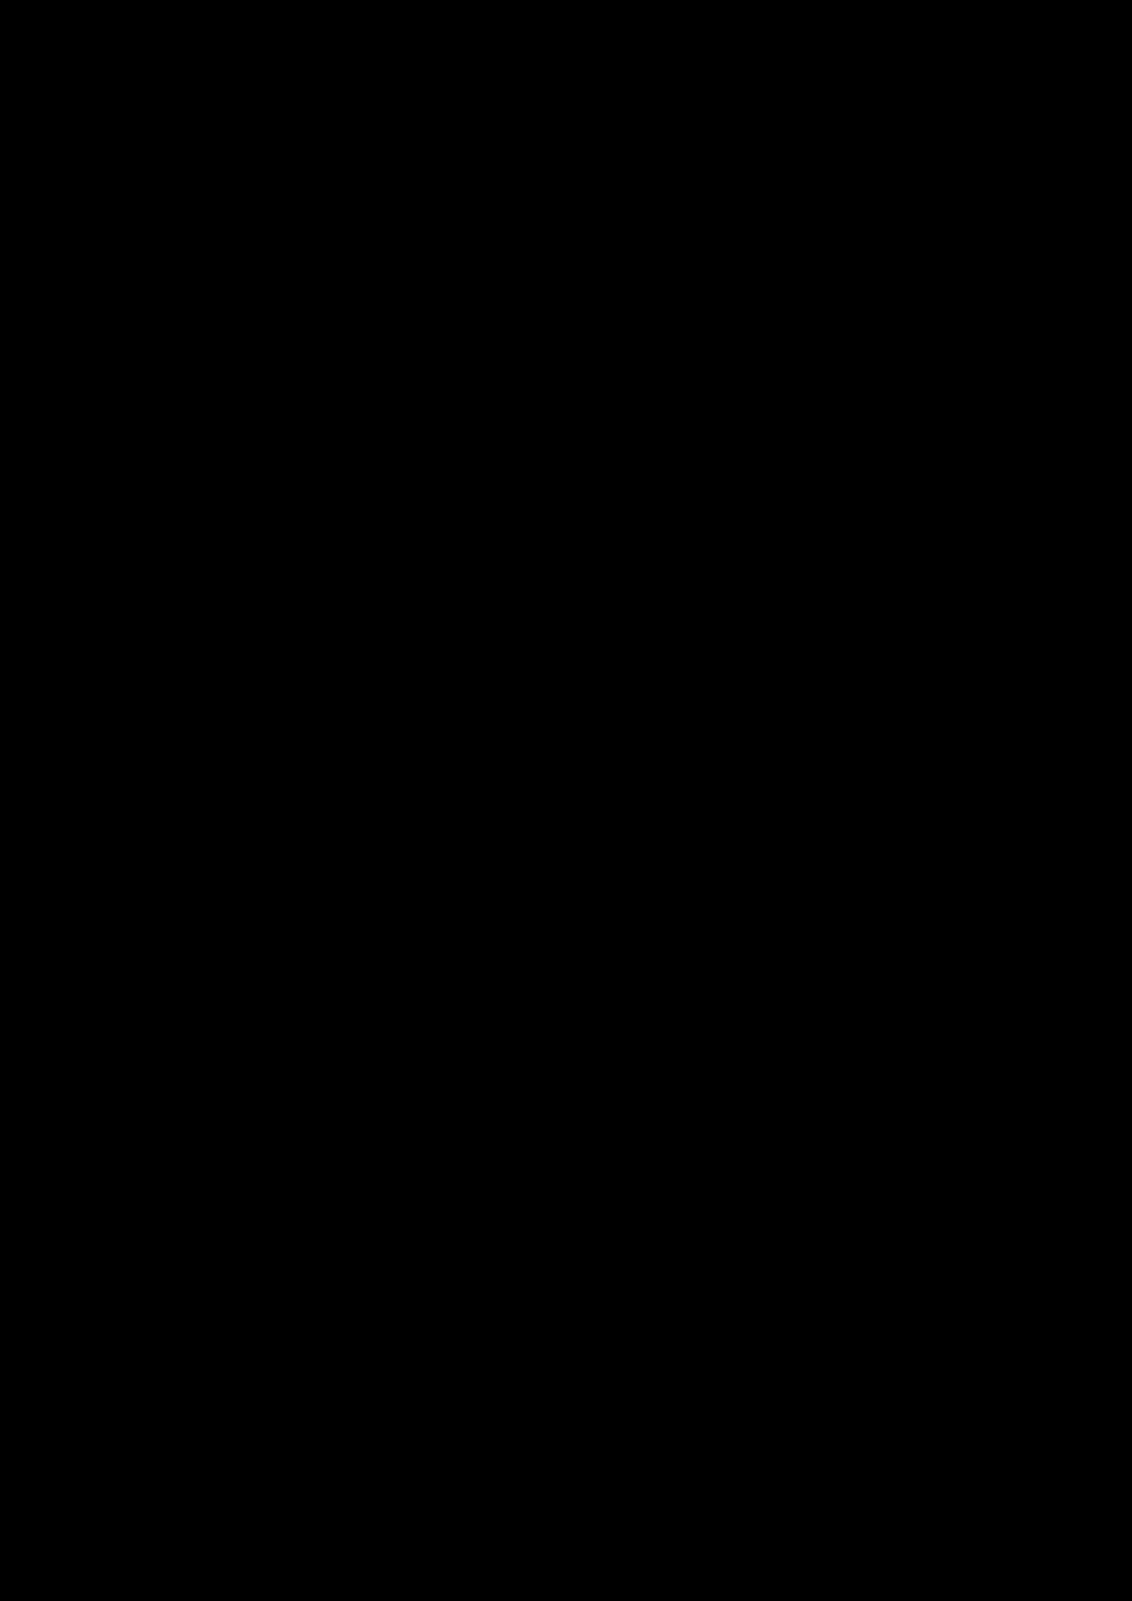 Belyiy sokol slide, Image 28